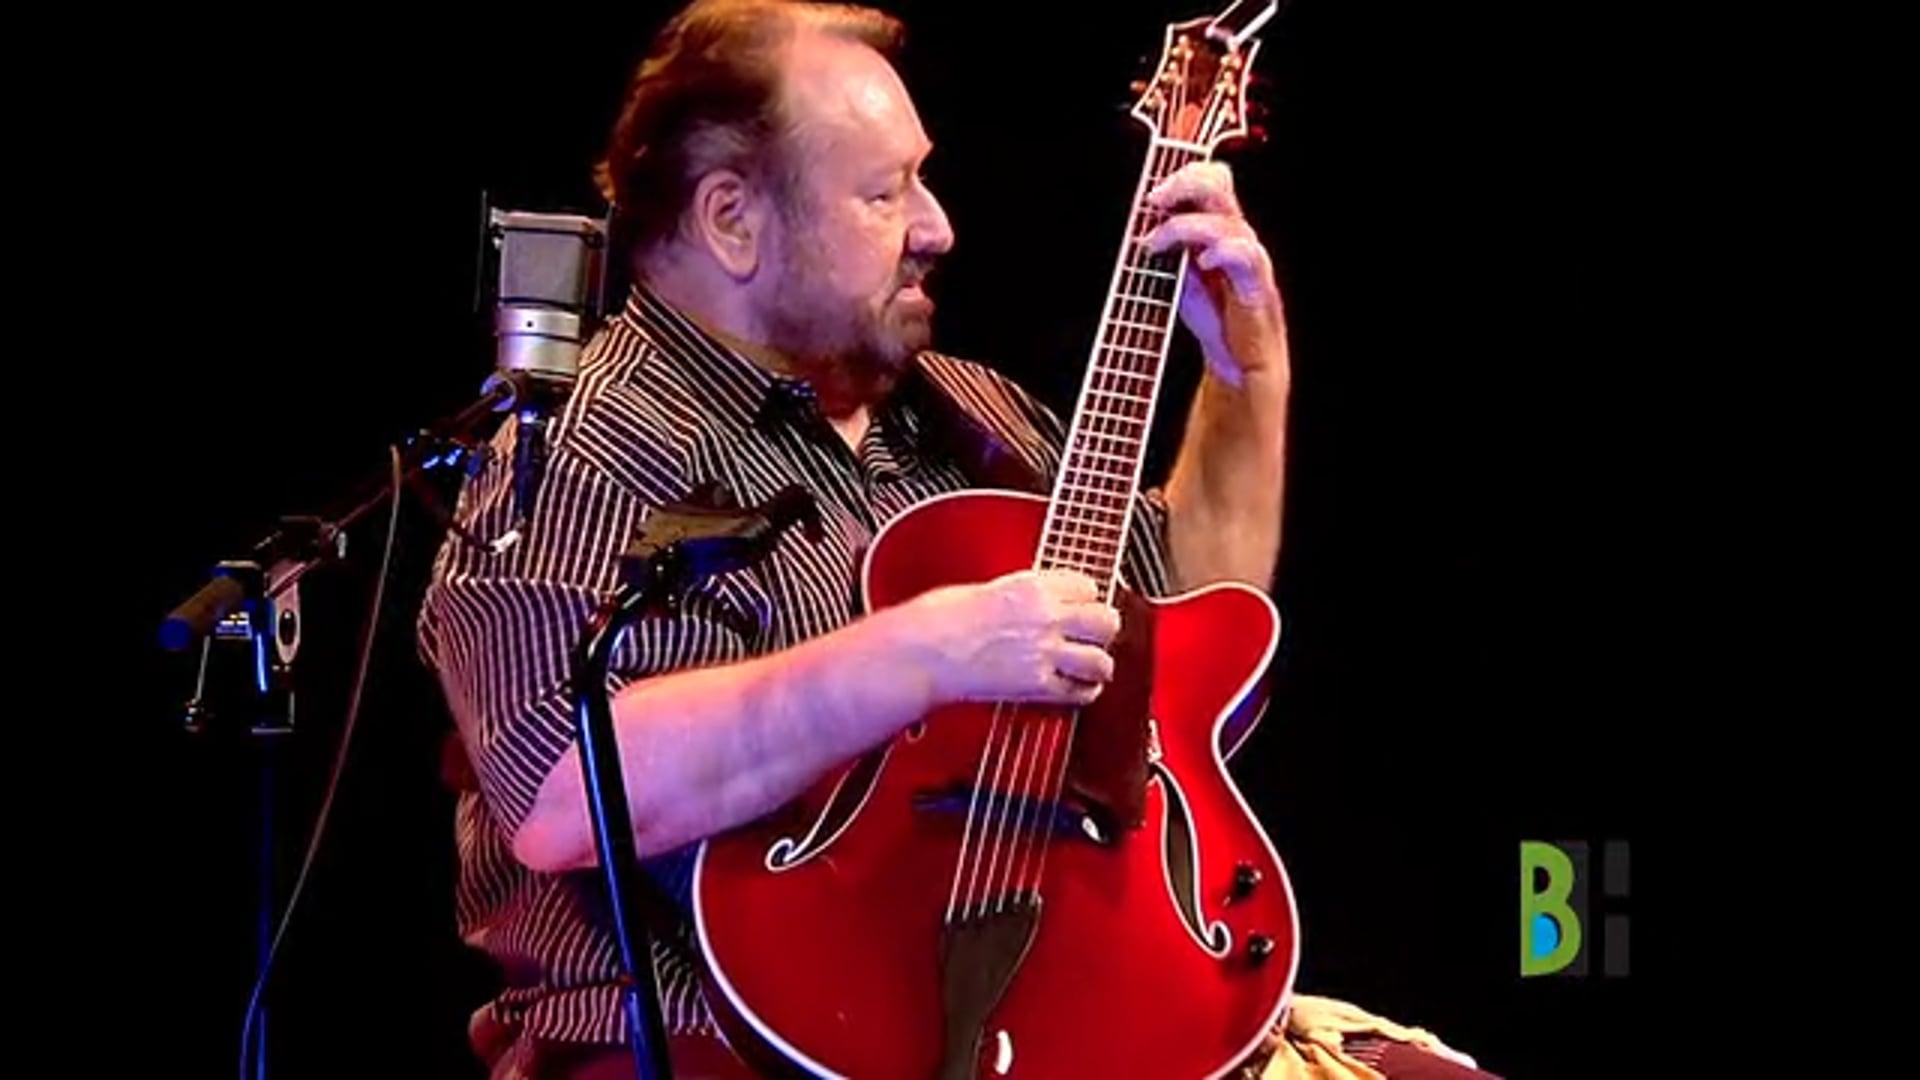 Beverly Hills Art Show Virtual Concert with Doug MacDonald